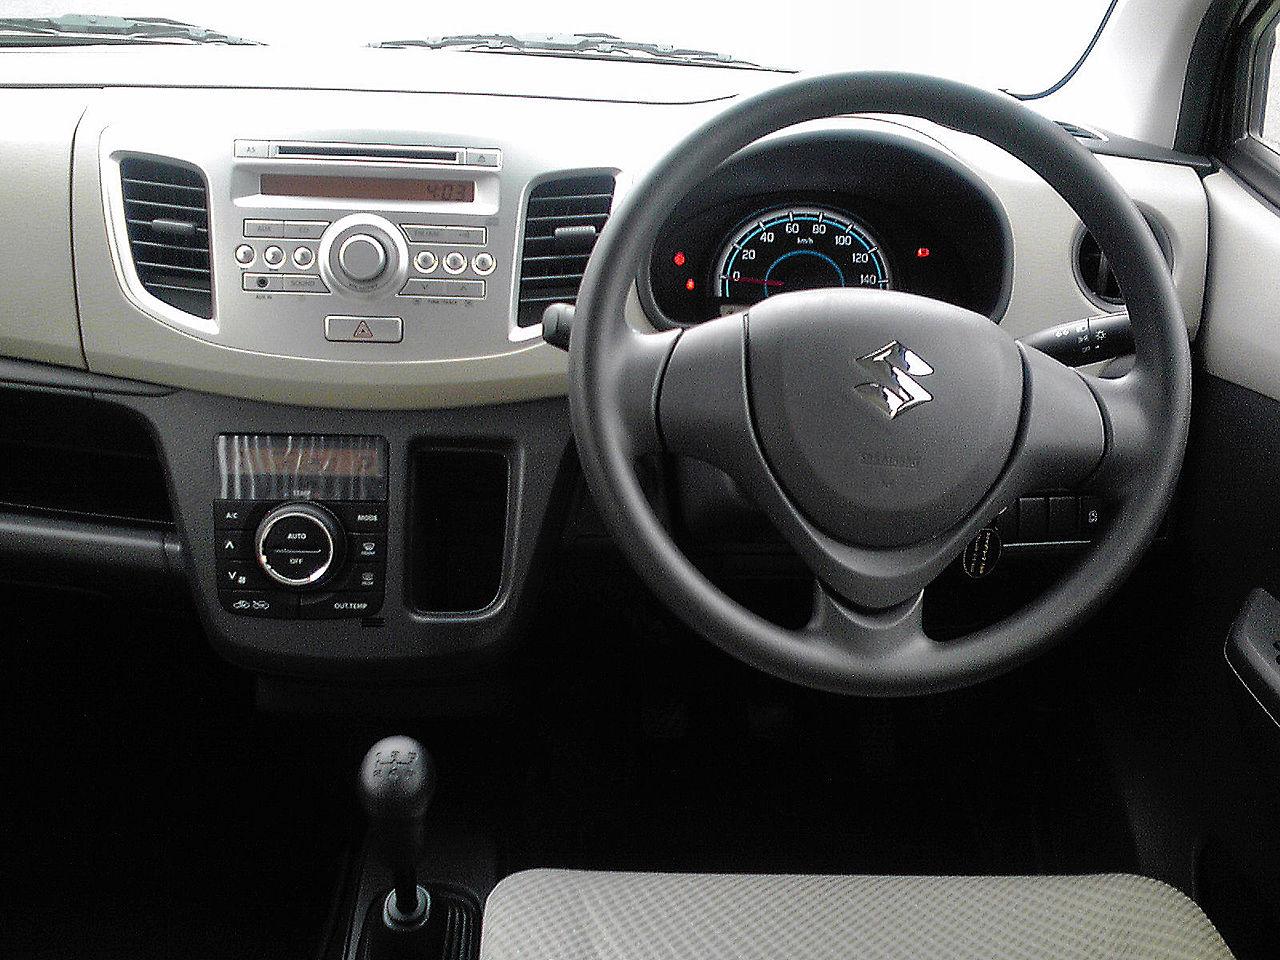 2007 Suzuki Wagon R